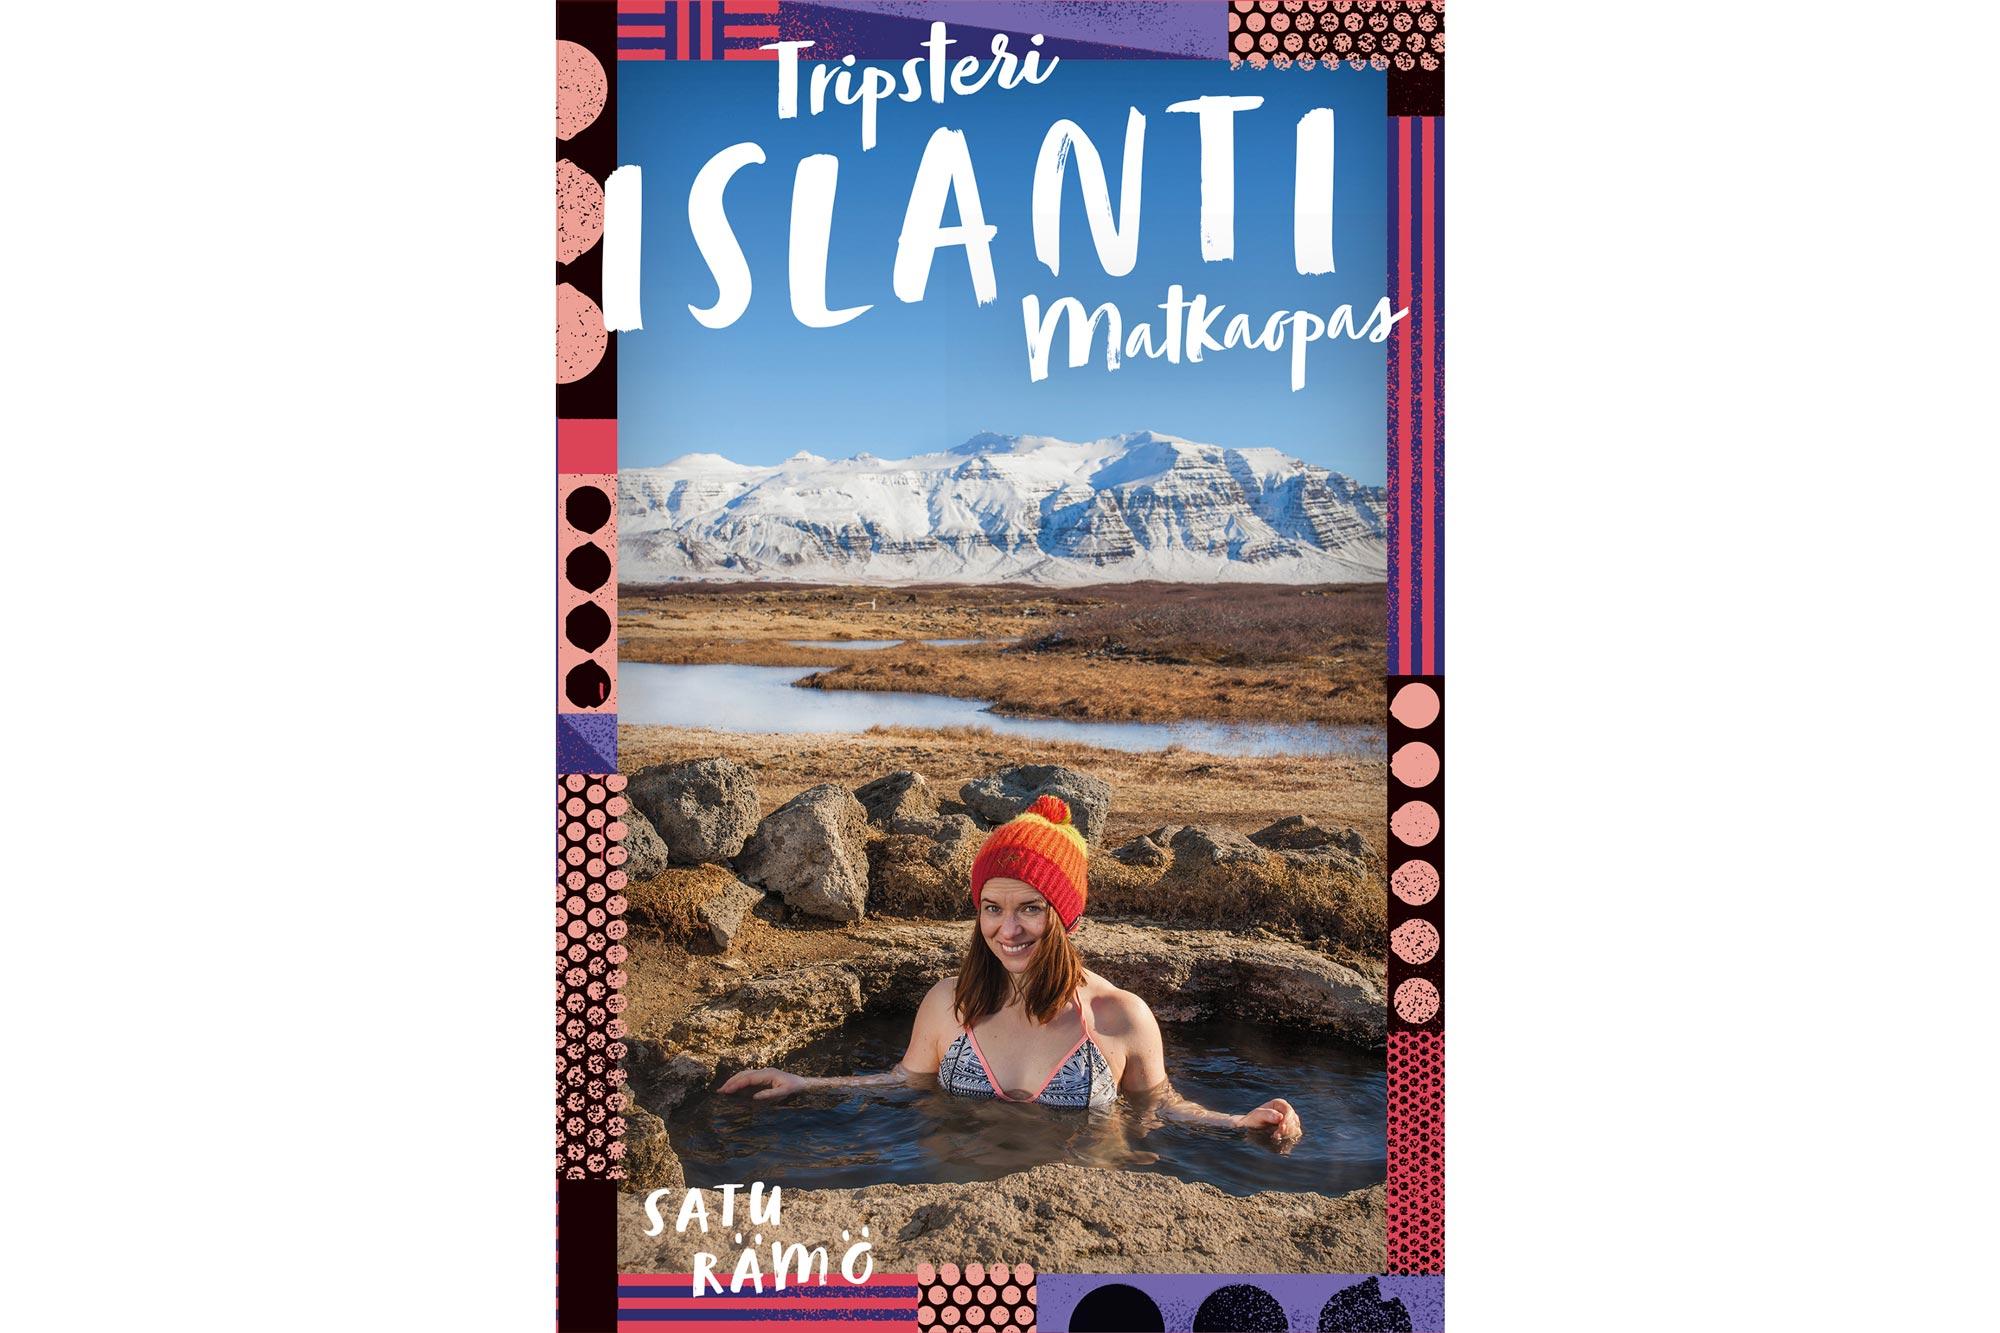 Tripsteri Islanti -matkaopas